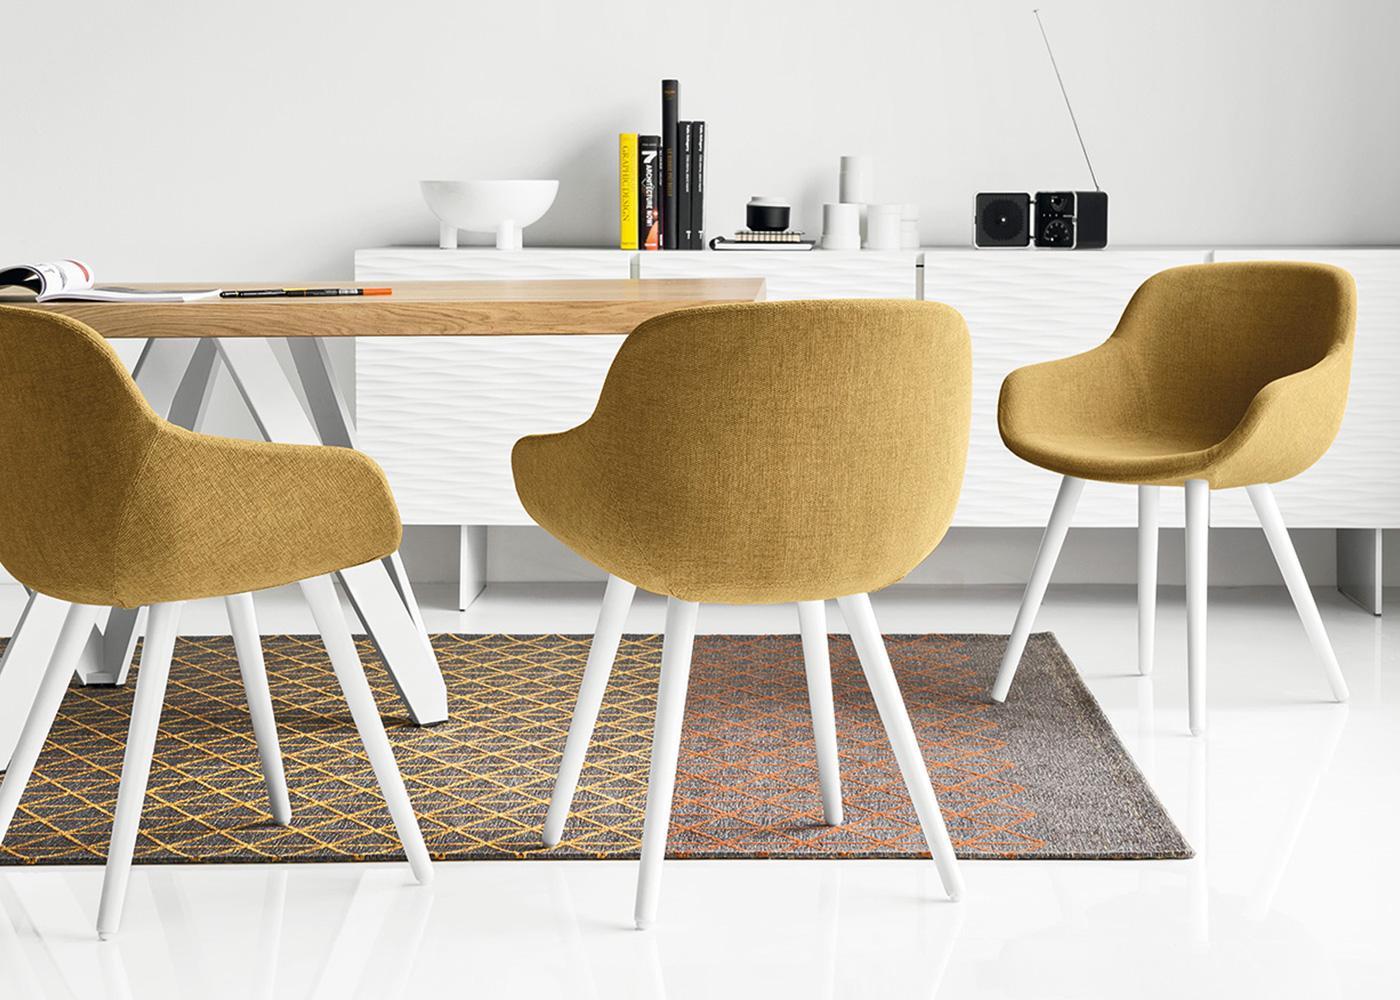 calligaris sofas uk chaise longue piel el corte ingles igloo chair midfurn furniture superstore